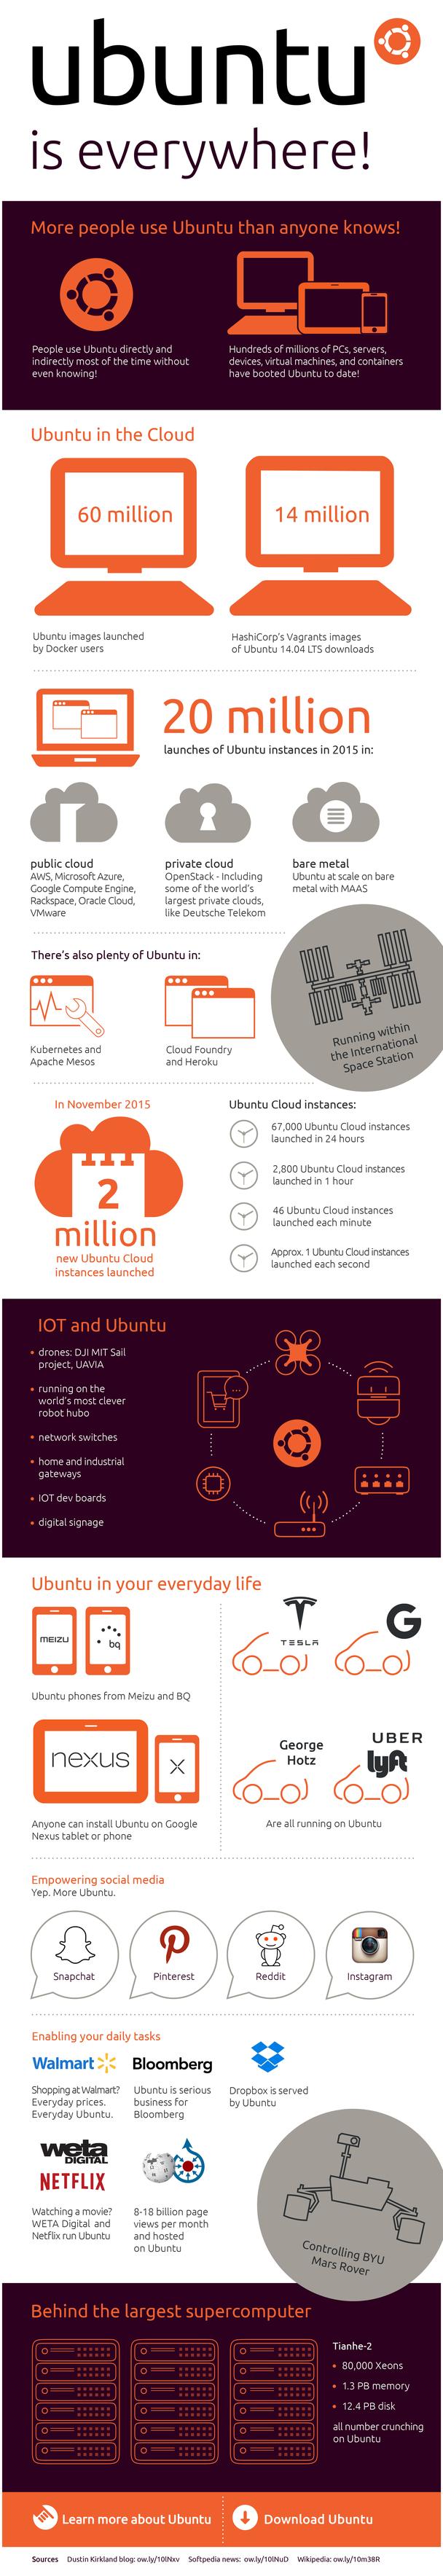 Infographic_Ubuntu-Everywhere